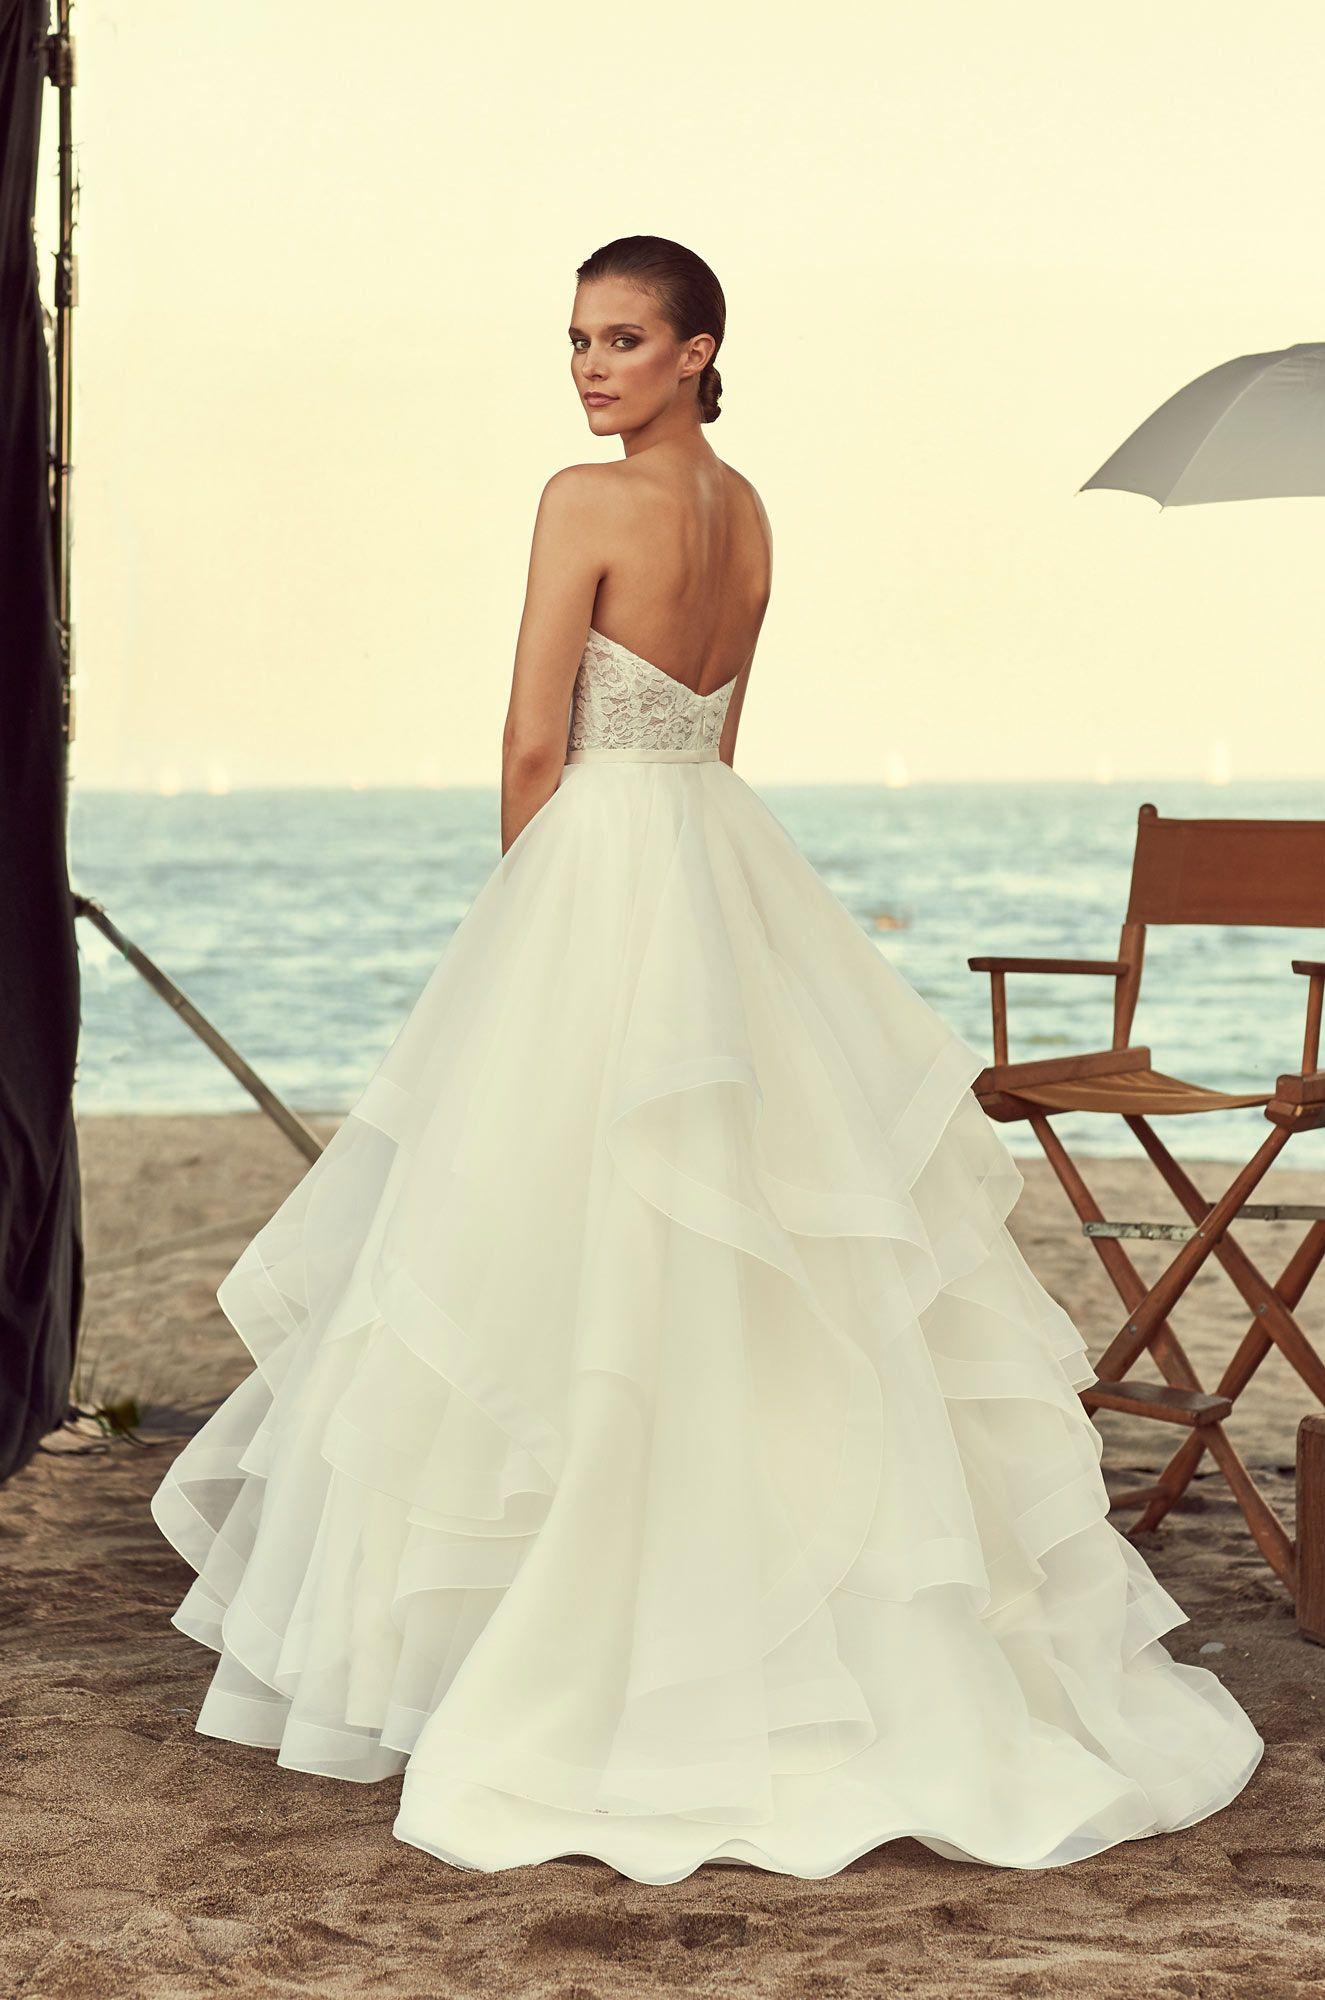 6f9079ba5b1 Strapless Corset Wedding Dress - Style  2192 in 2019